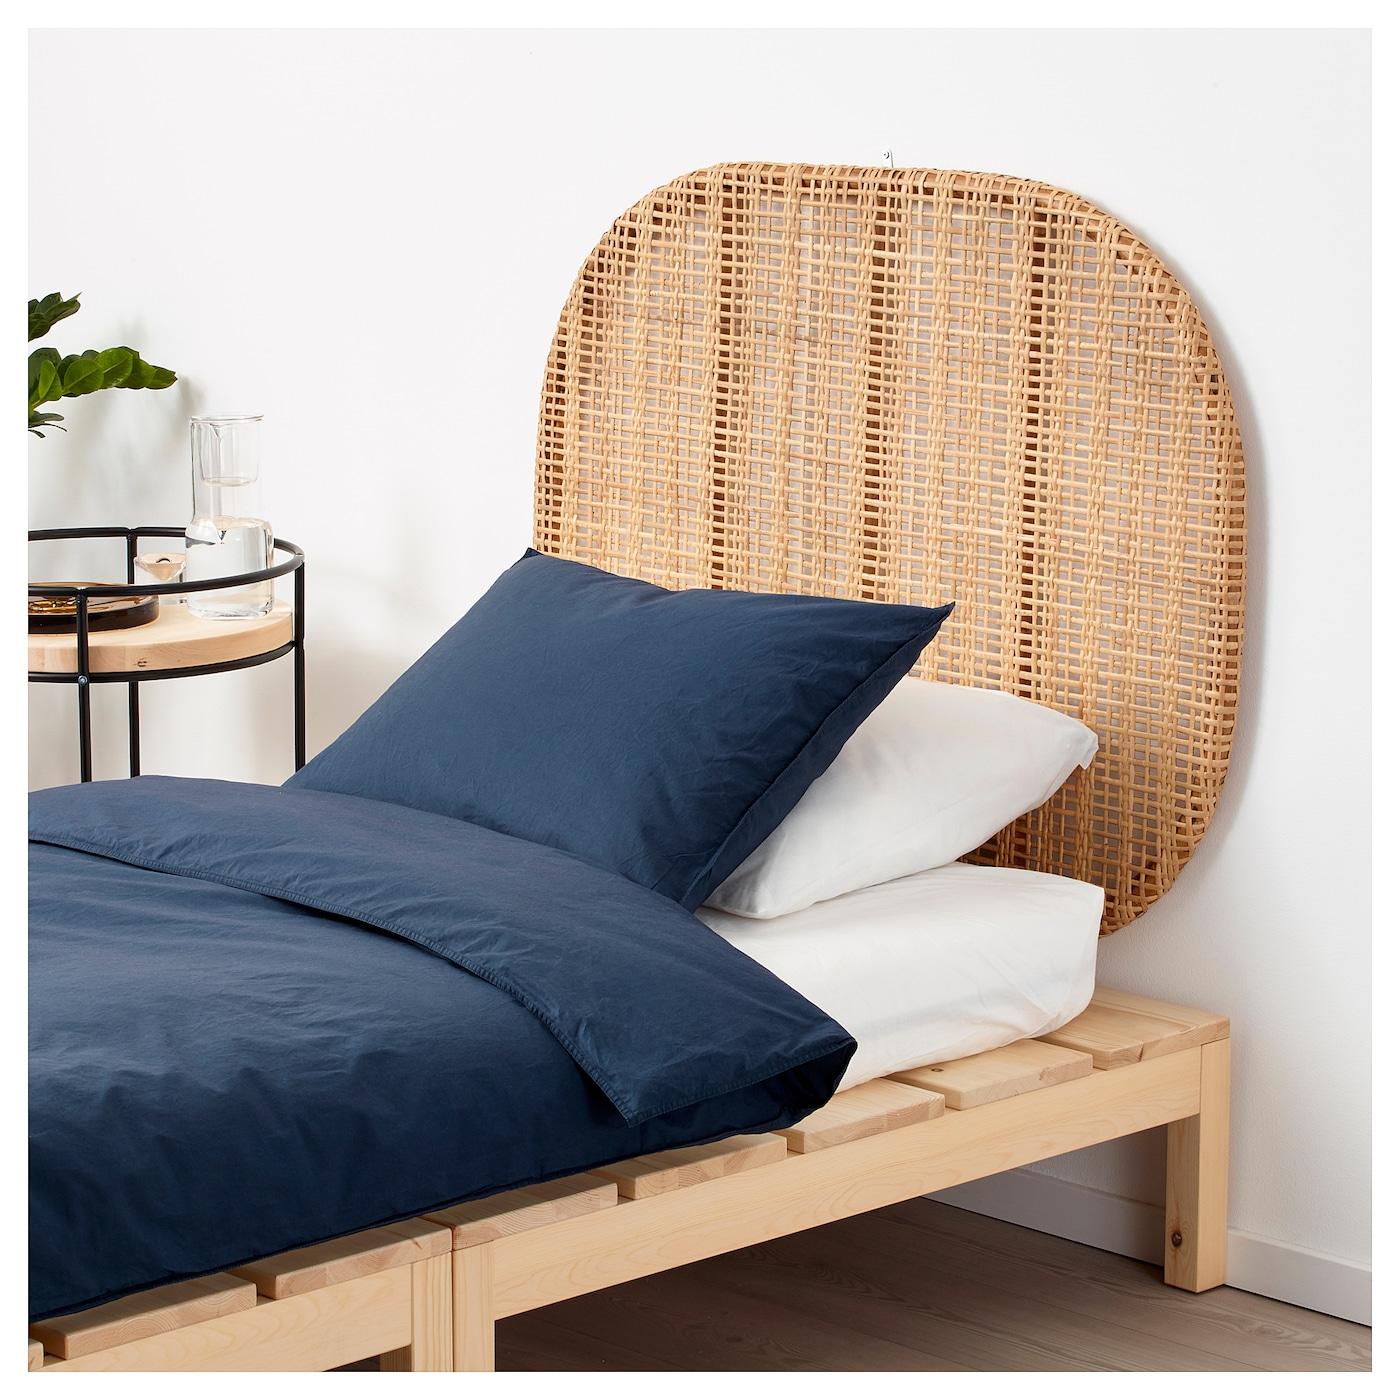 hj rtelig headboard rattan wall mounted 100 cm ikea. Black Bedroom Furniture Sets. Home Design Ideas